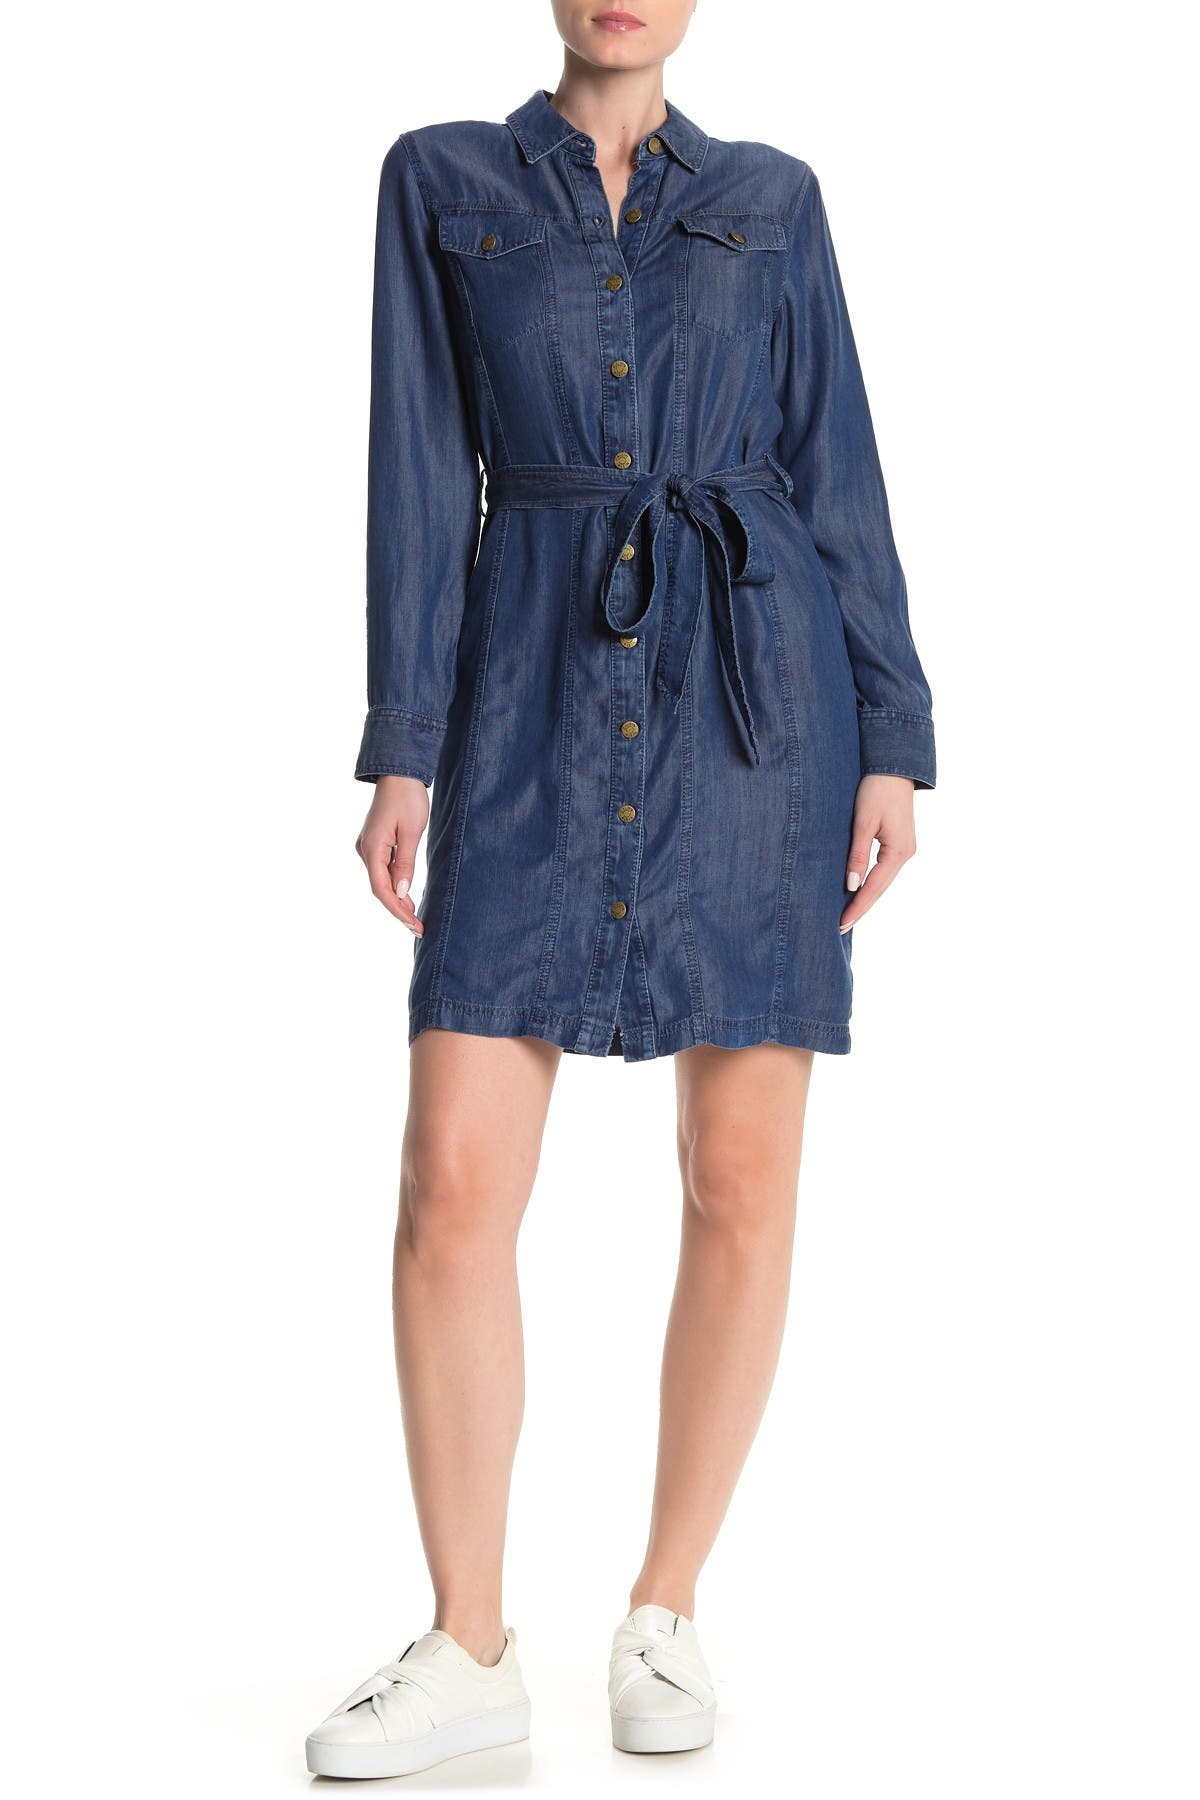 Image of Calvin Klein Button Front Shirt Dress